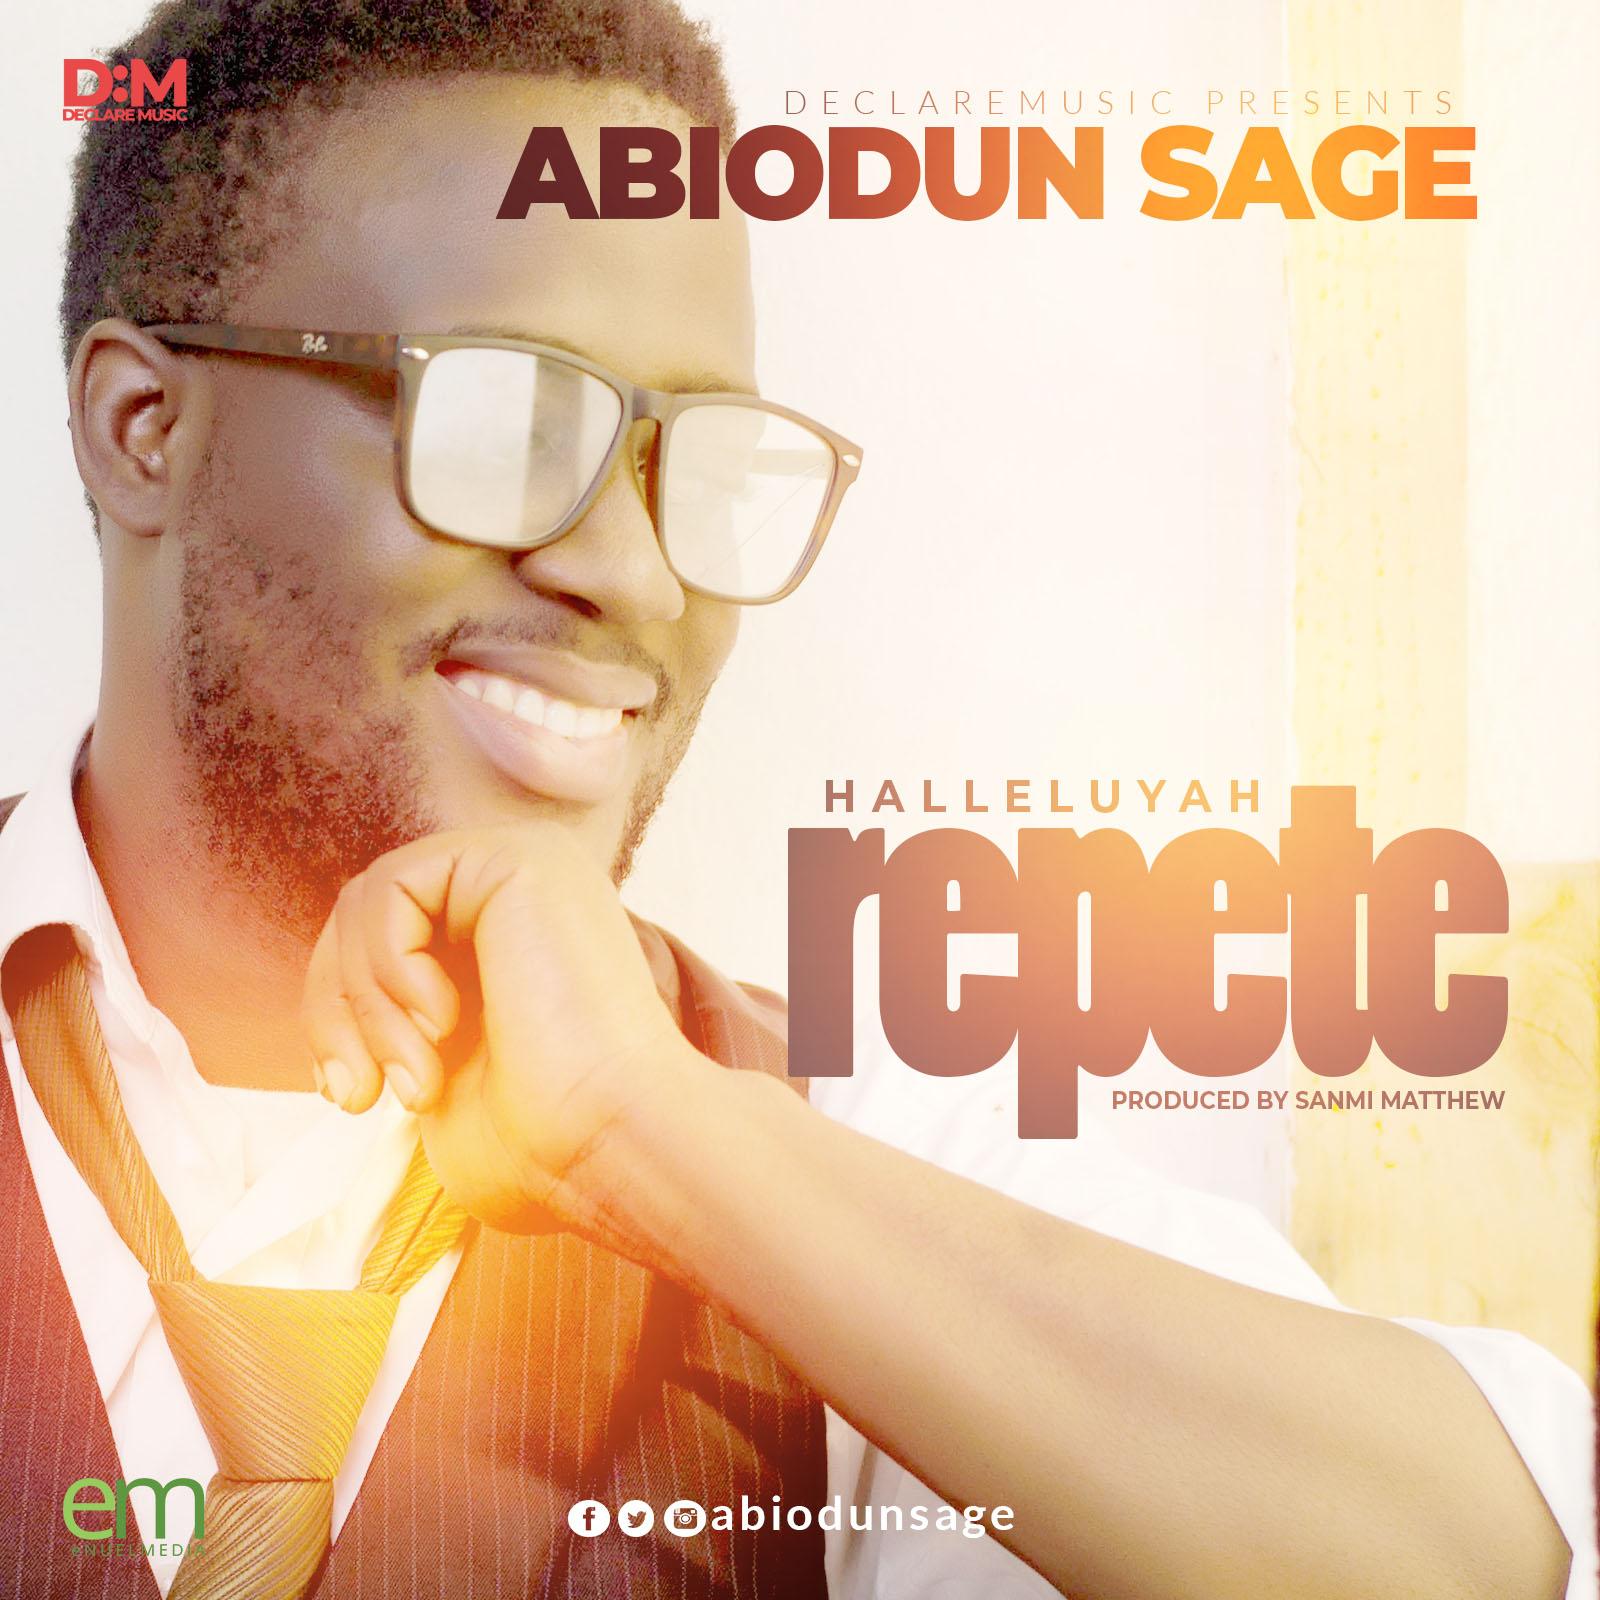 Abiodun SAGE - Halleluyah Repete  {@abiodunsage}